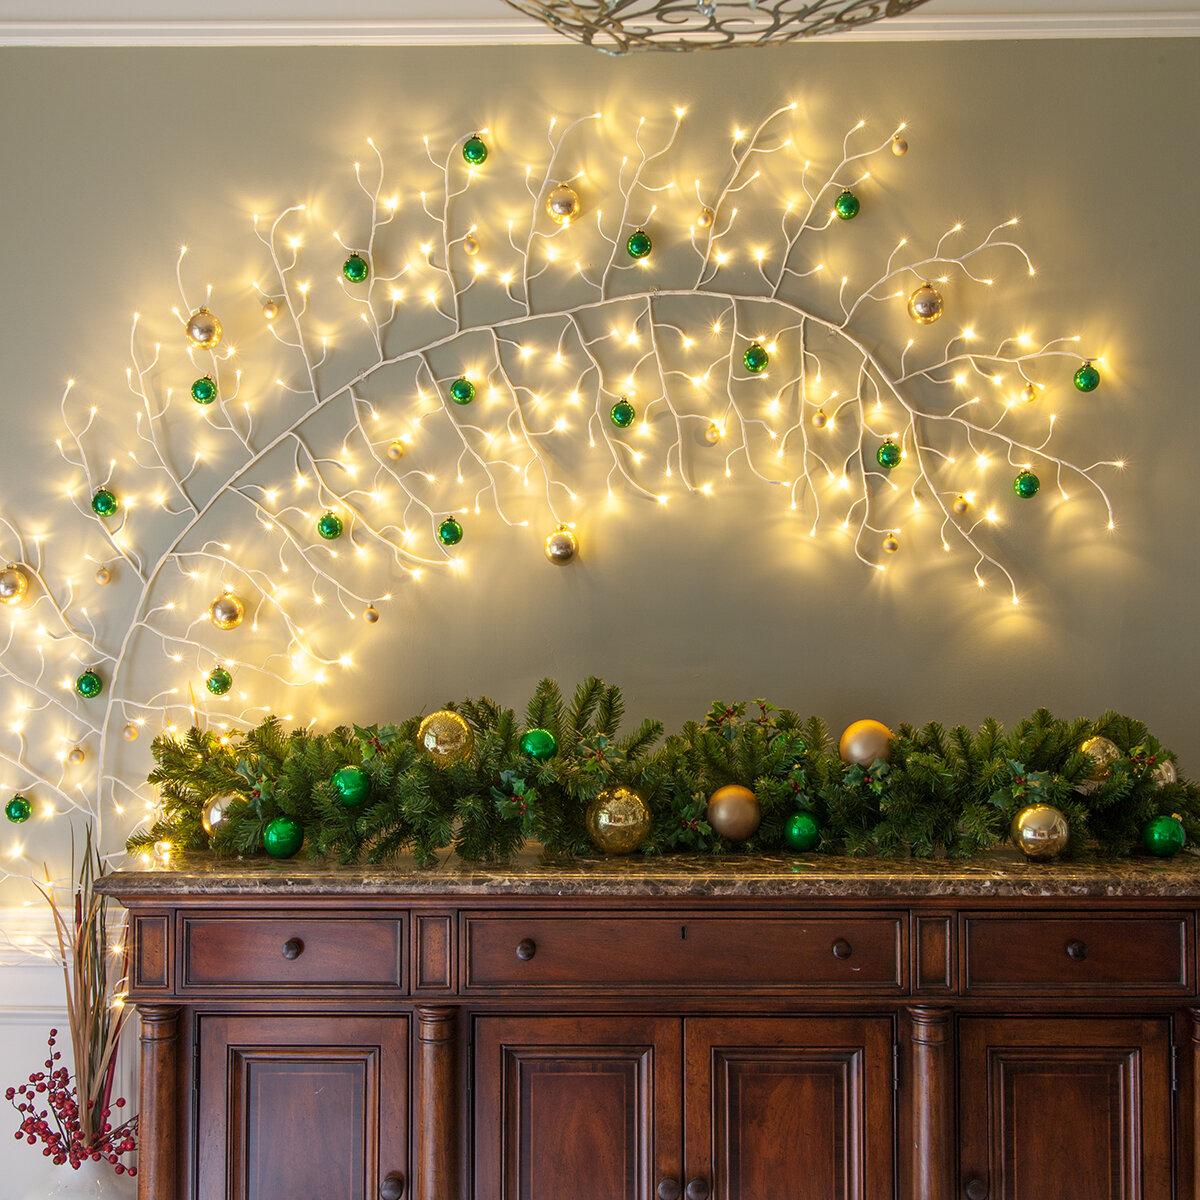 The Holiday Aisle Climbing Vine LED String Lighting & Reviews   Wayfair